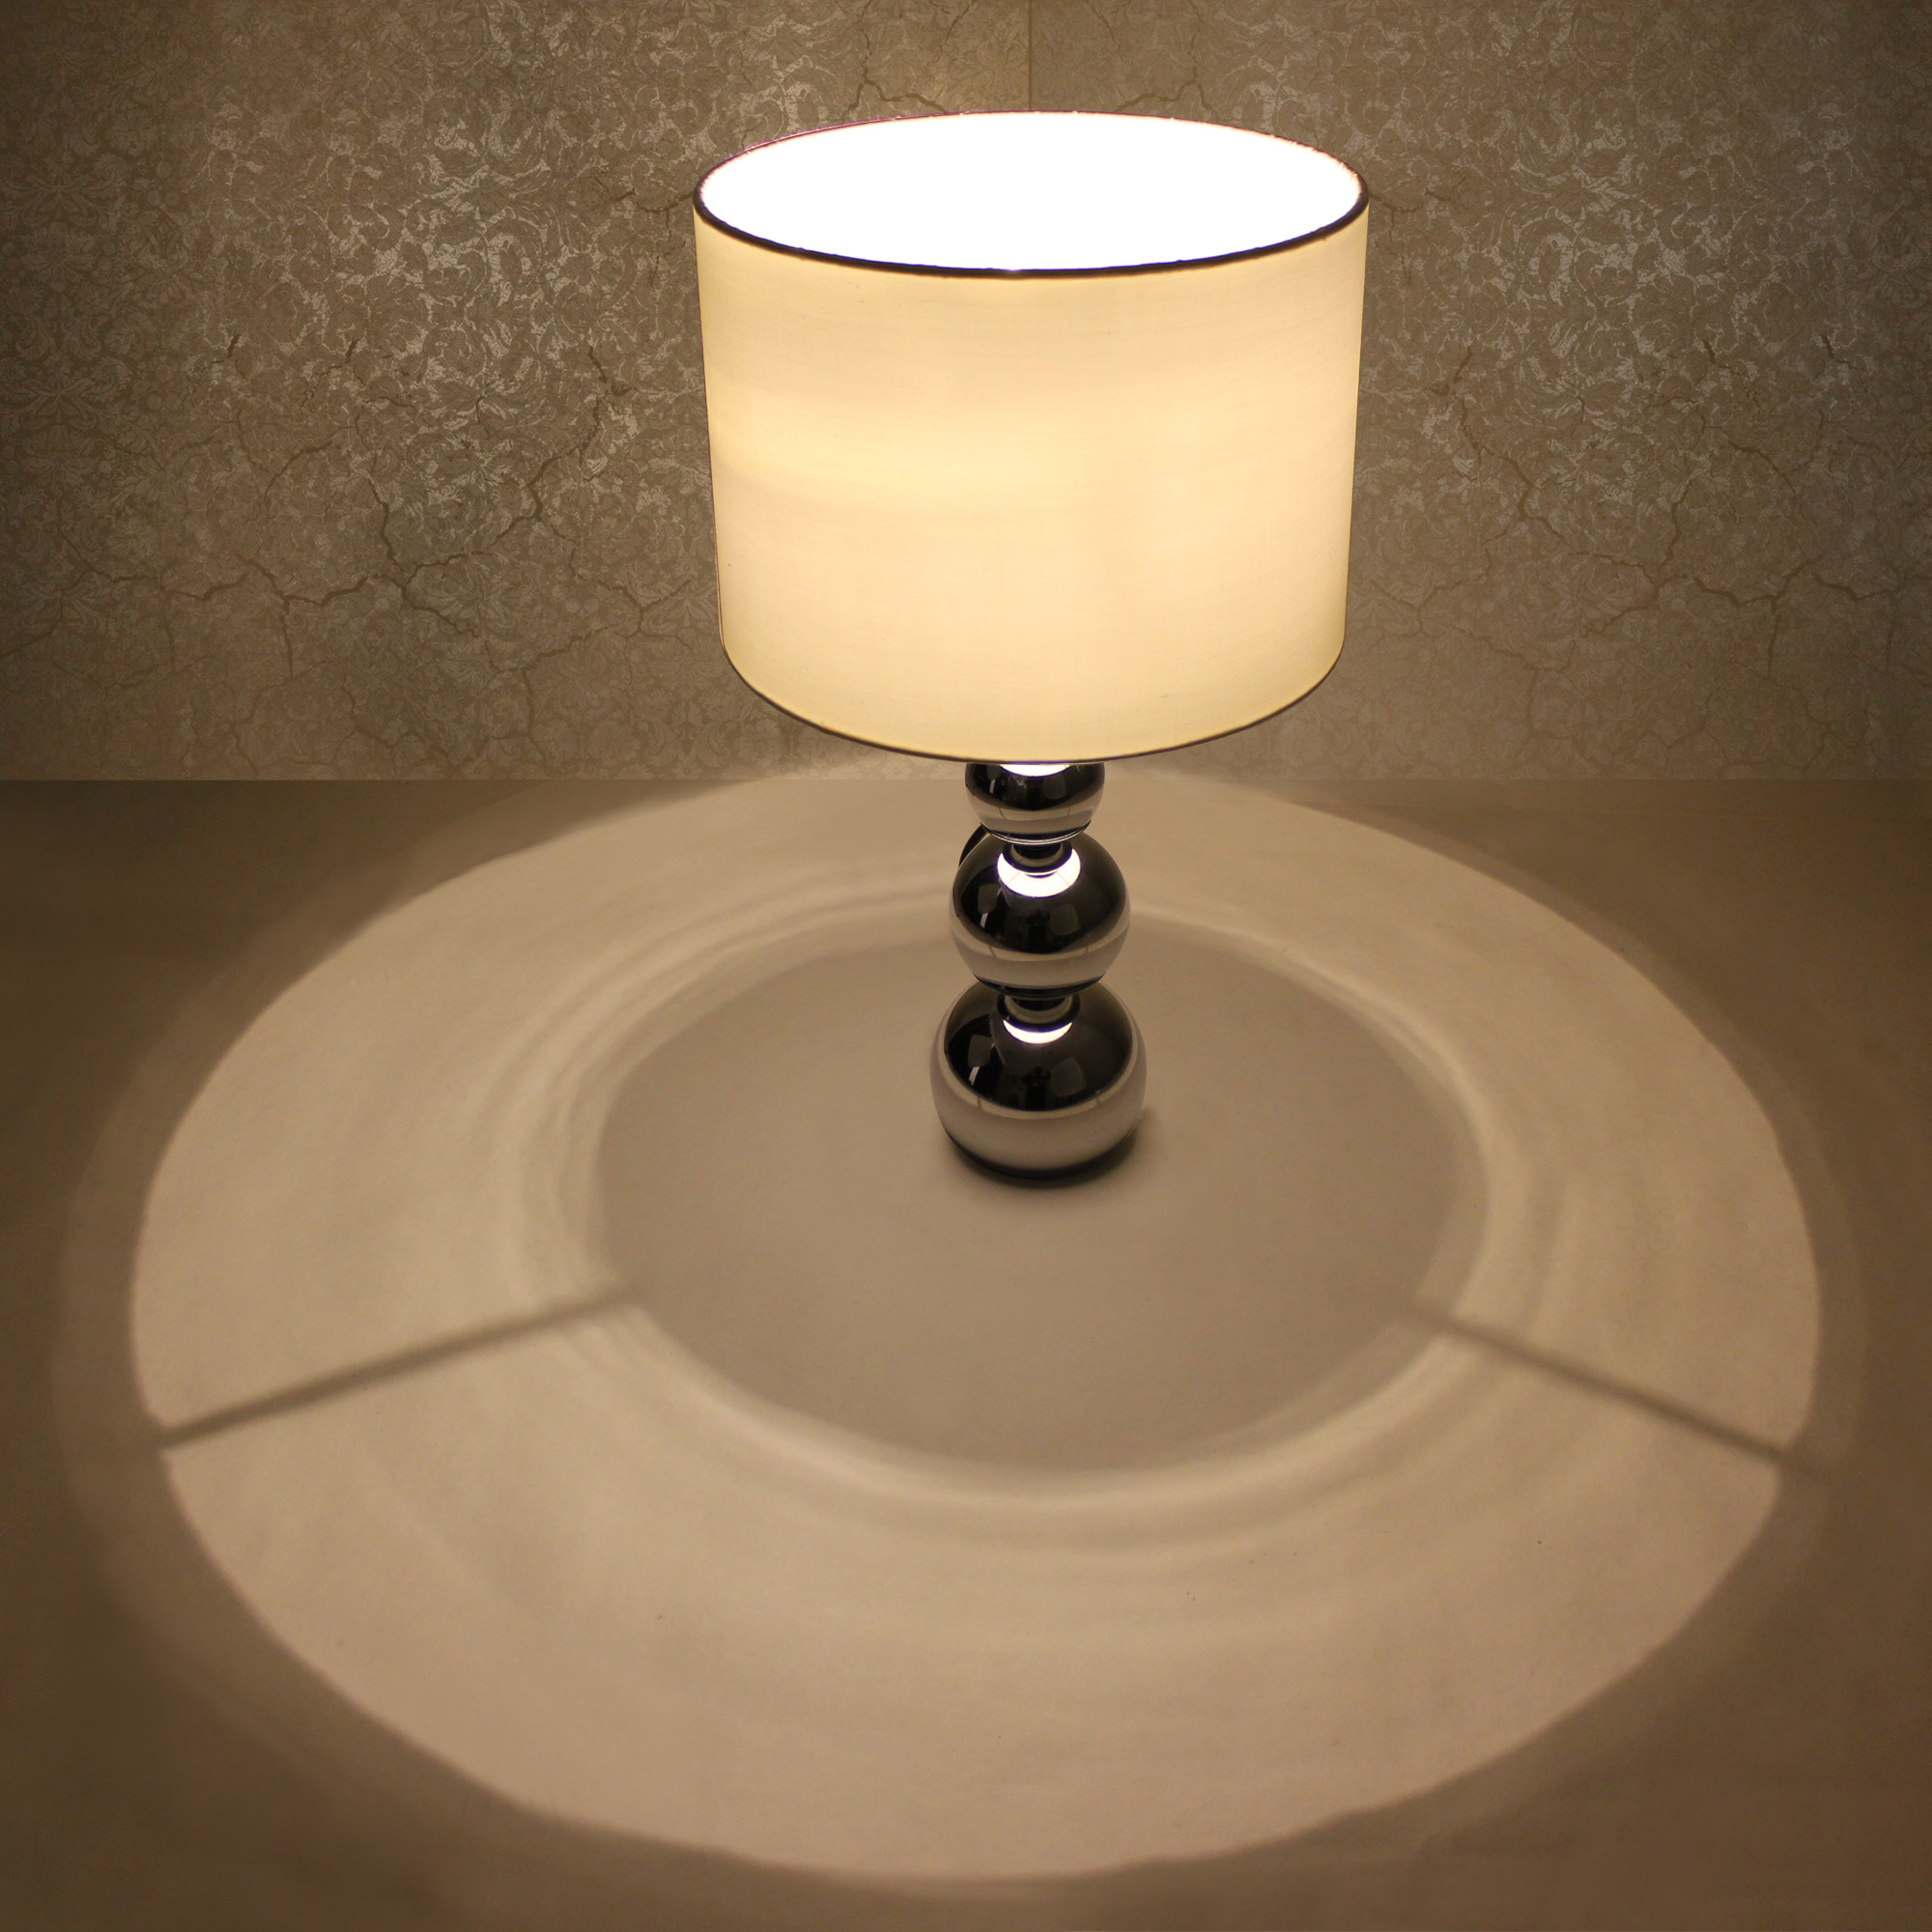 Ebay - Lampe de table de nuit ...